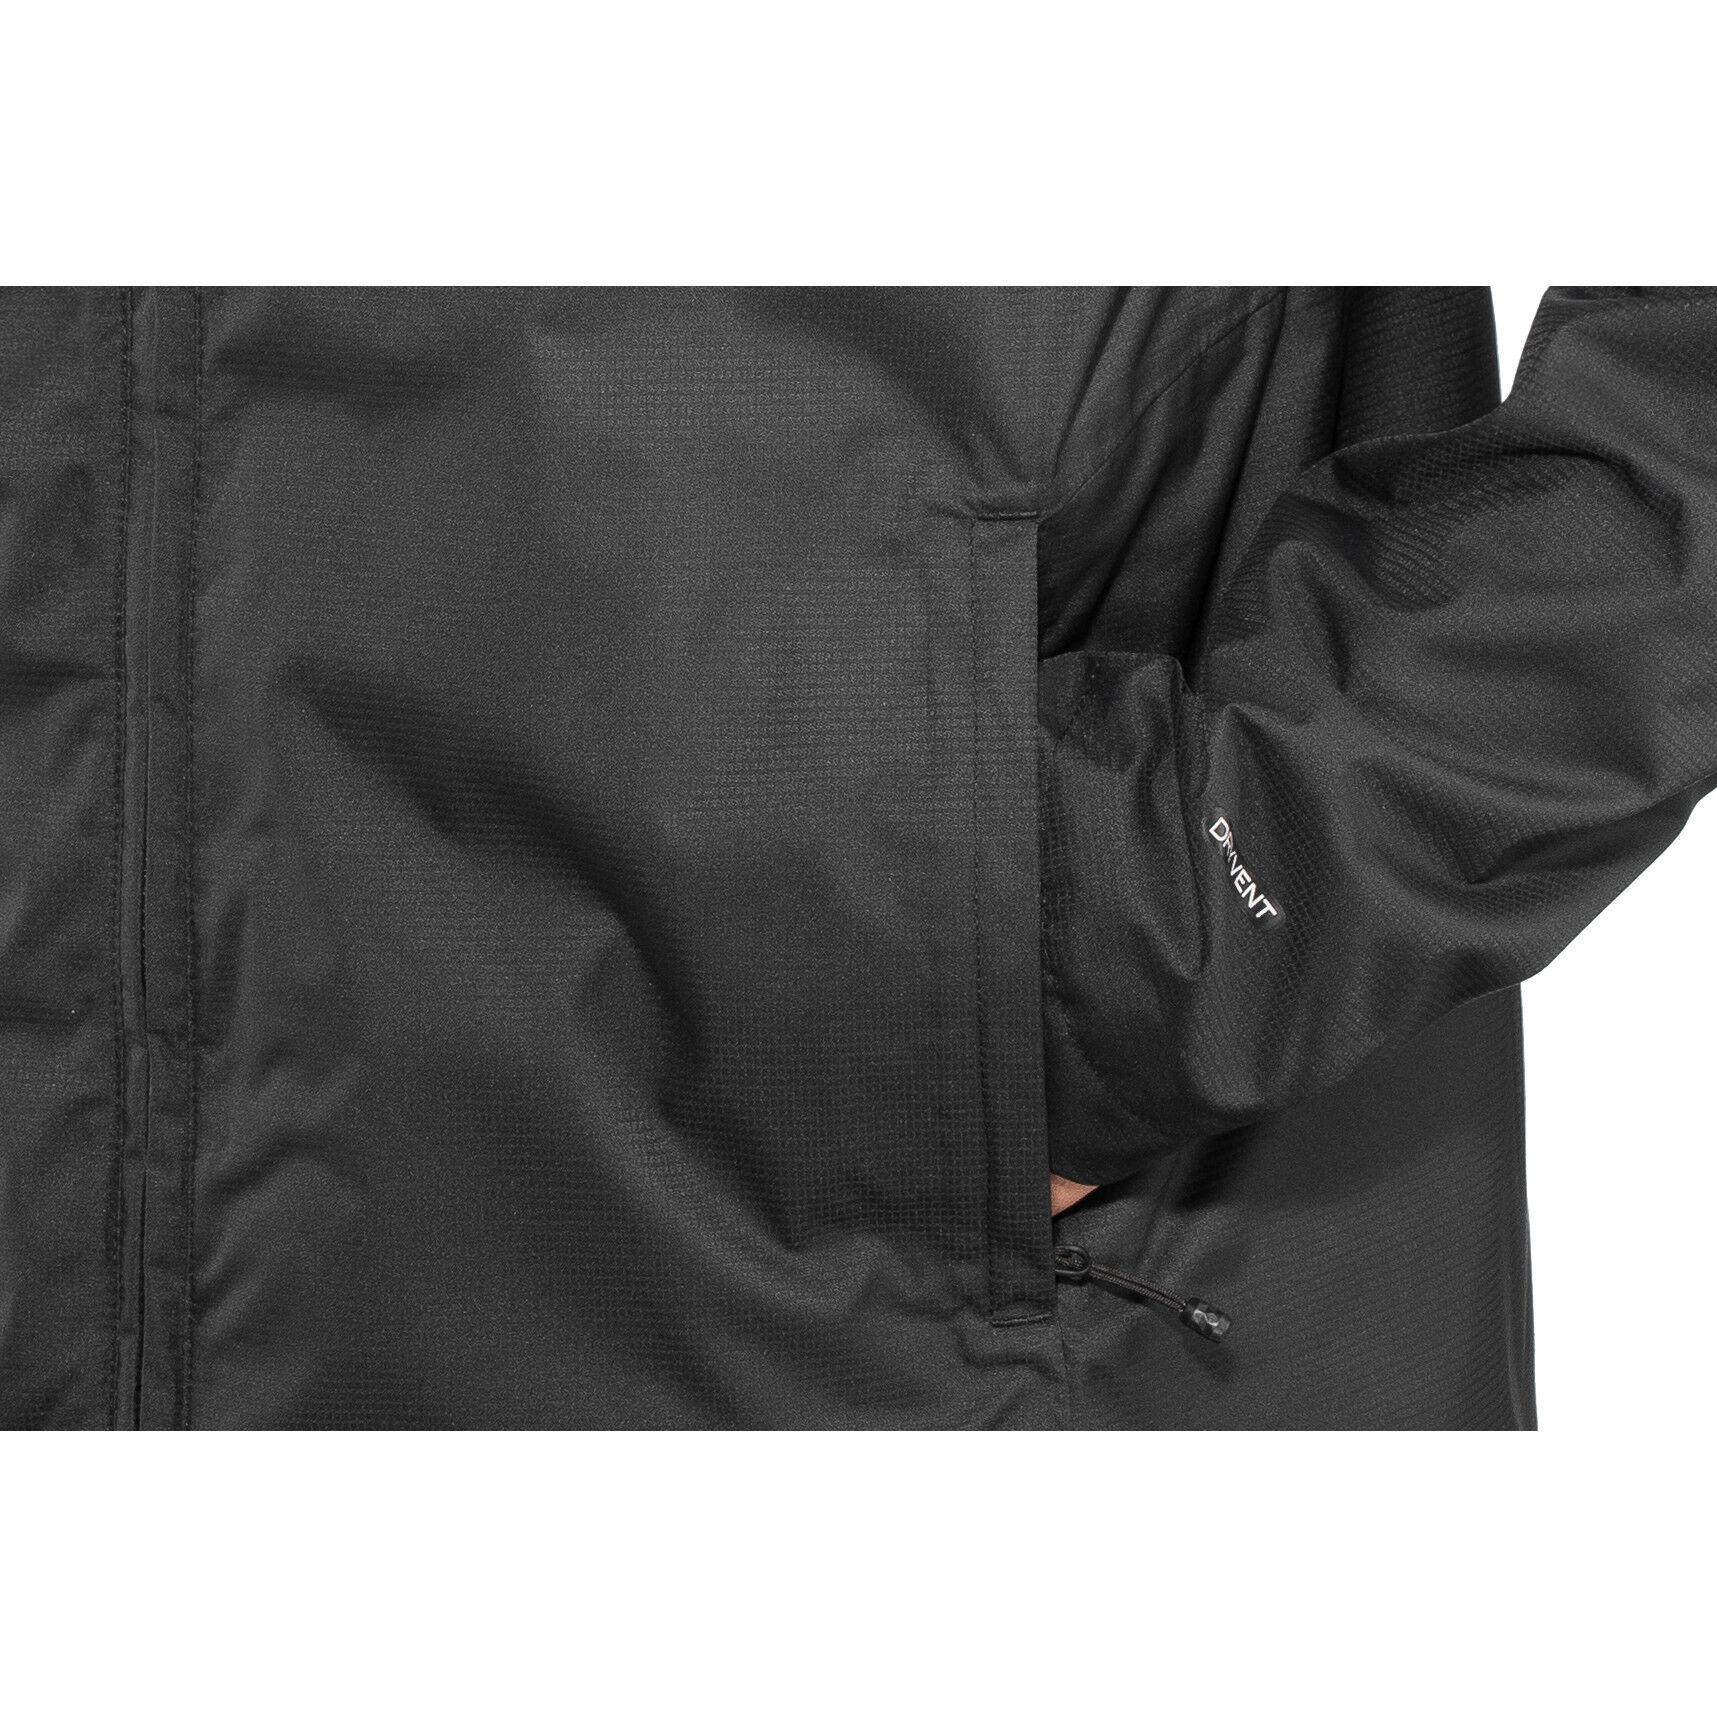 Tnf Face Frost Herren Black North Ii Peak Jacket The Lq43RcAj5